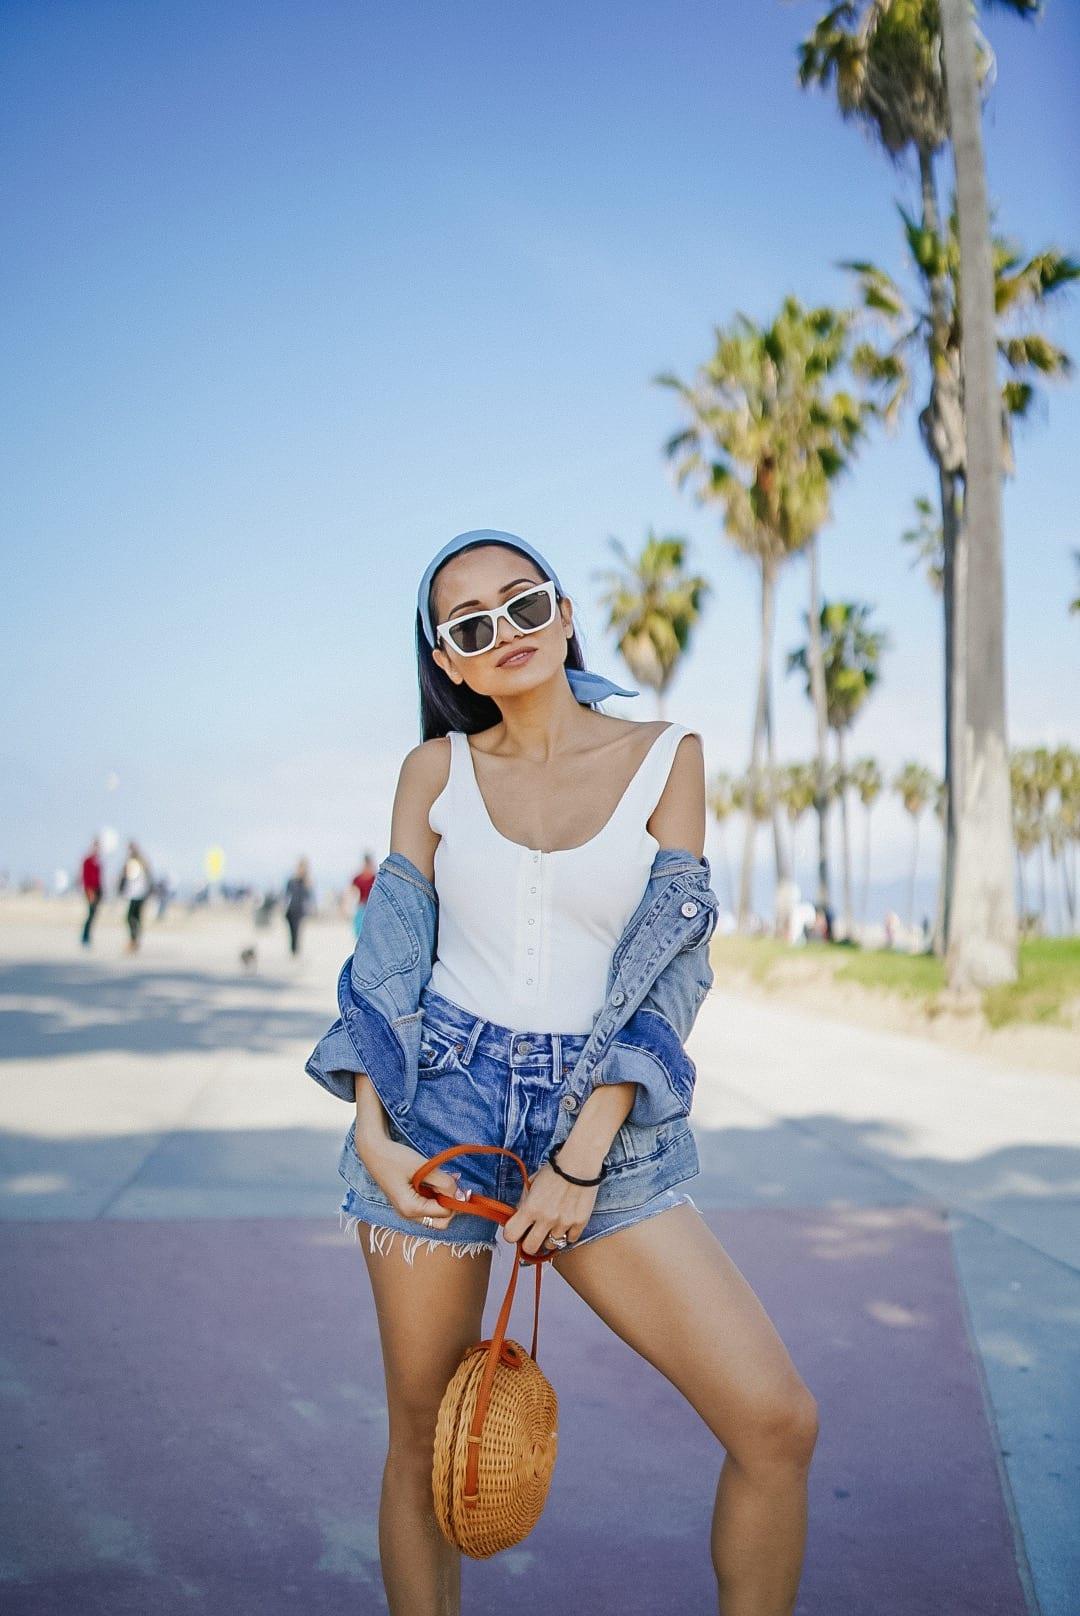 revolve festival, Quay sunglasses, GRlfrnd denim